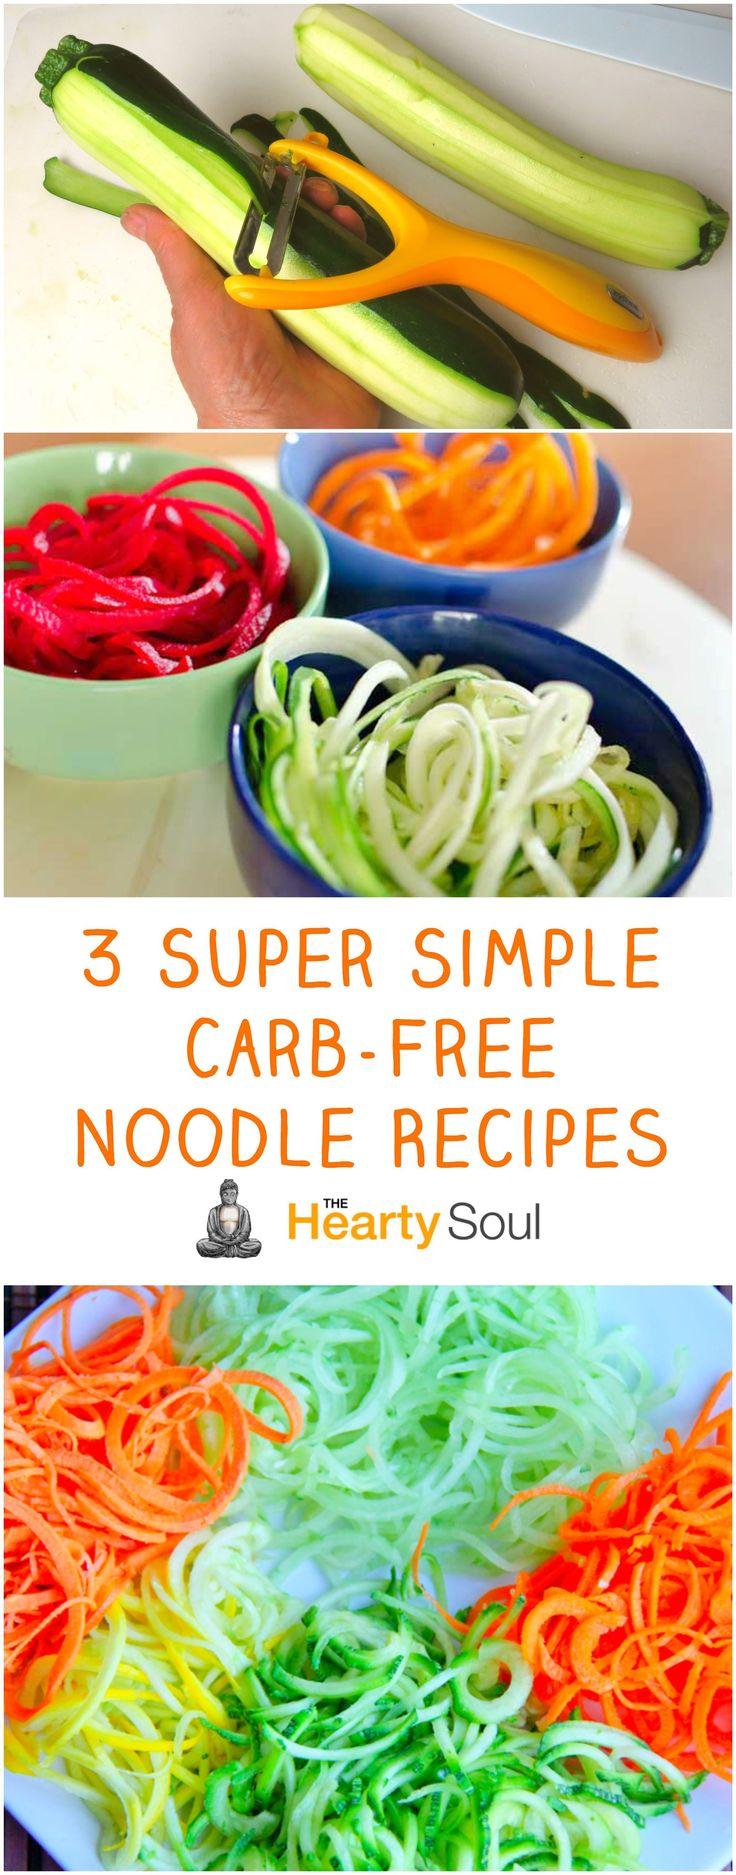 3 Super Simple Carb-Free Noodle Recipes